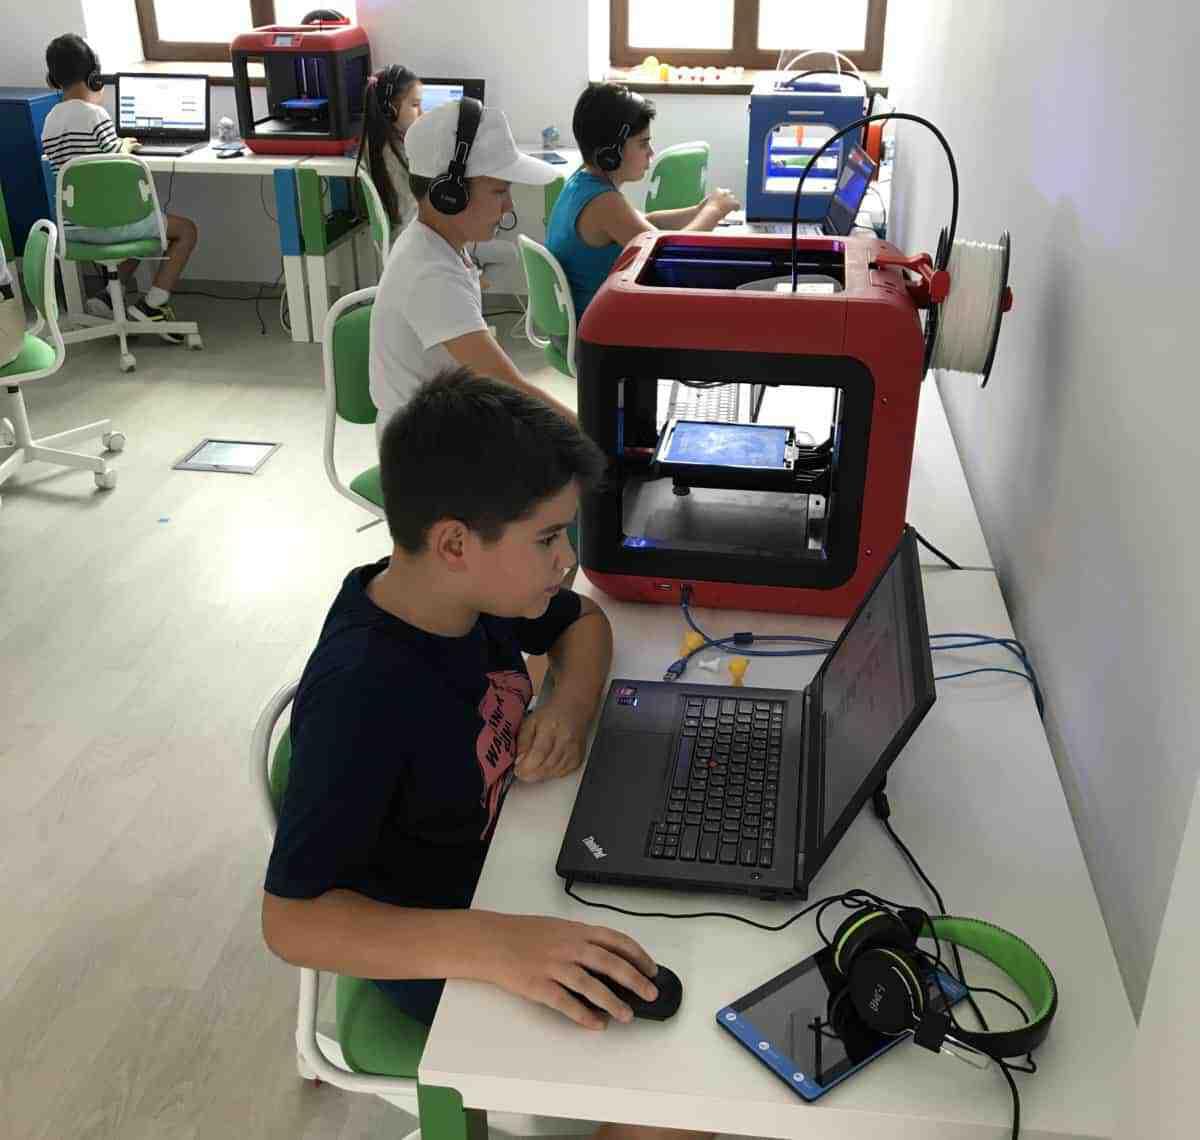 Copii in Makerspace-ul NextLab.Tech / Foto: nextlab.tech